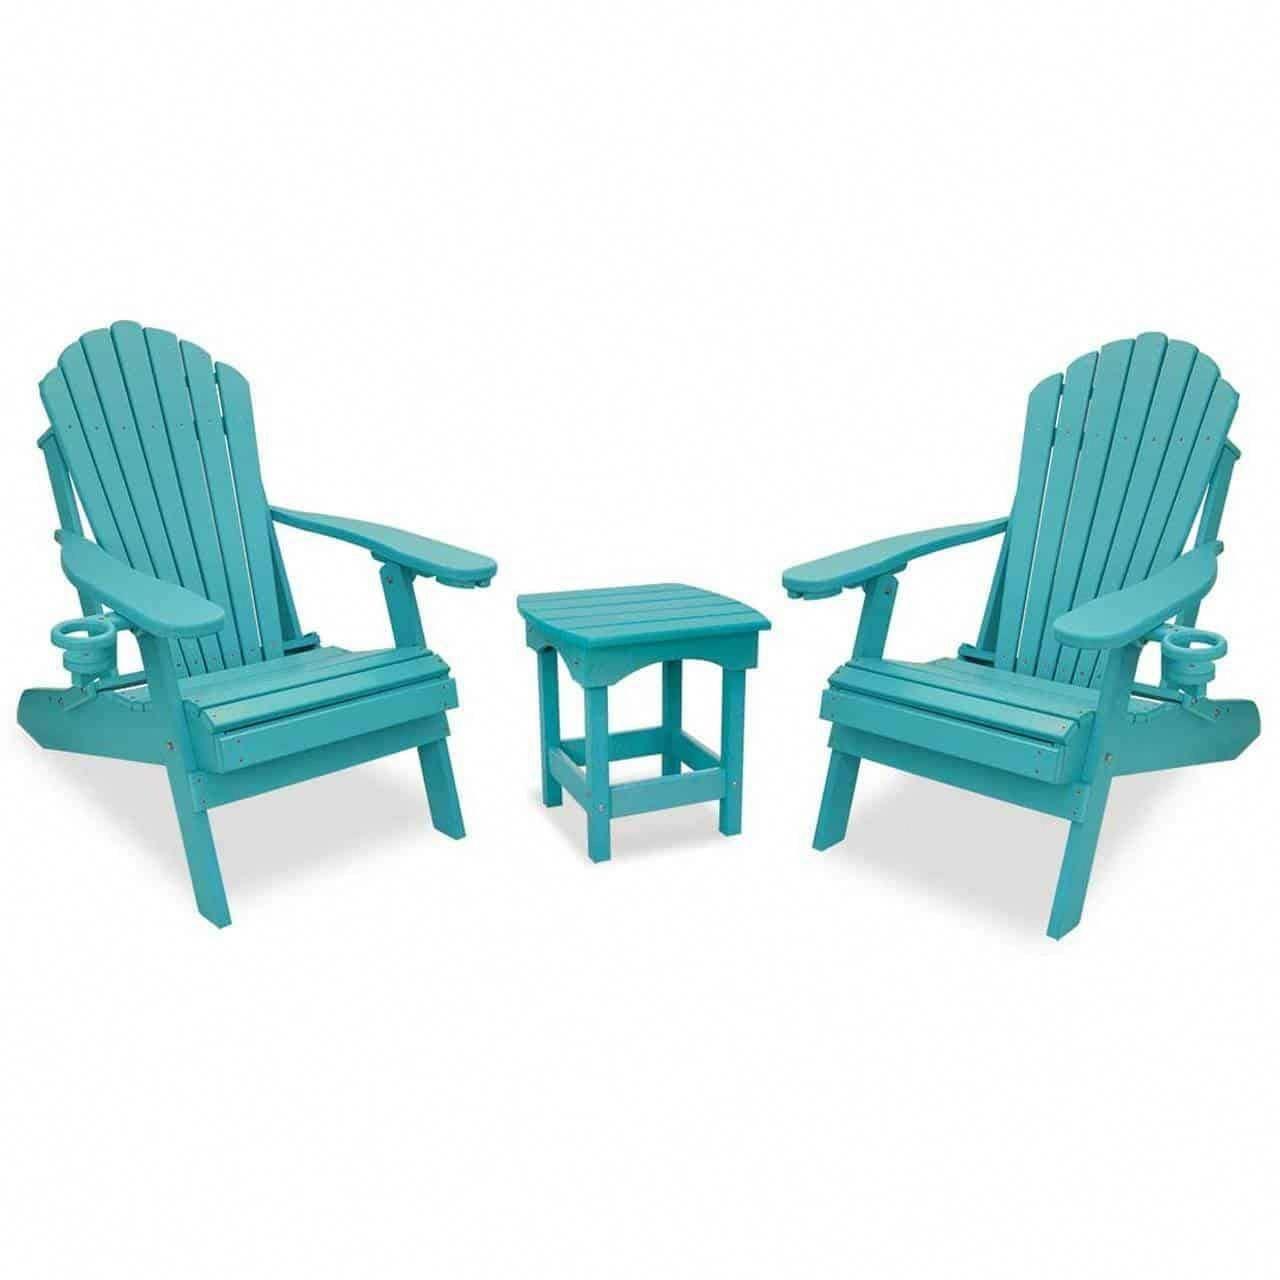 Eccb outodor outer banks 3piece deluxe adirondack chair